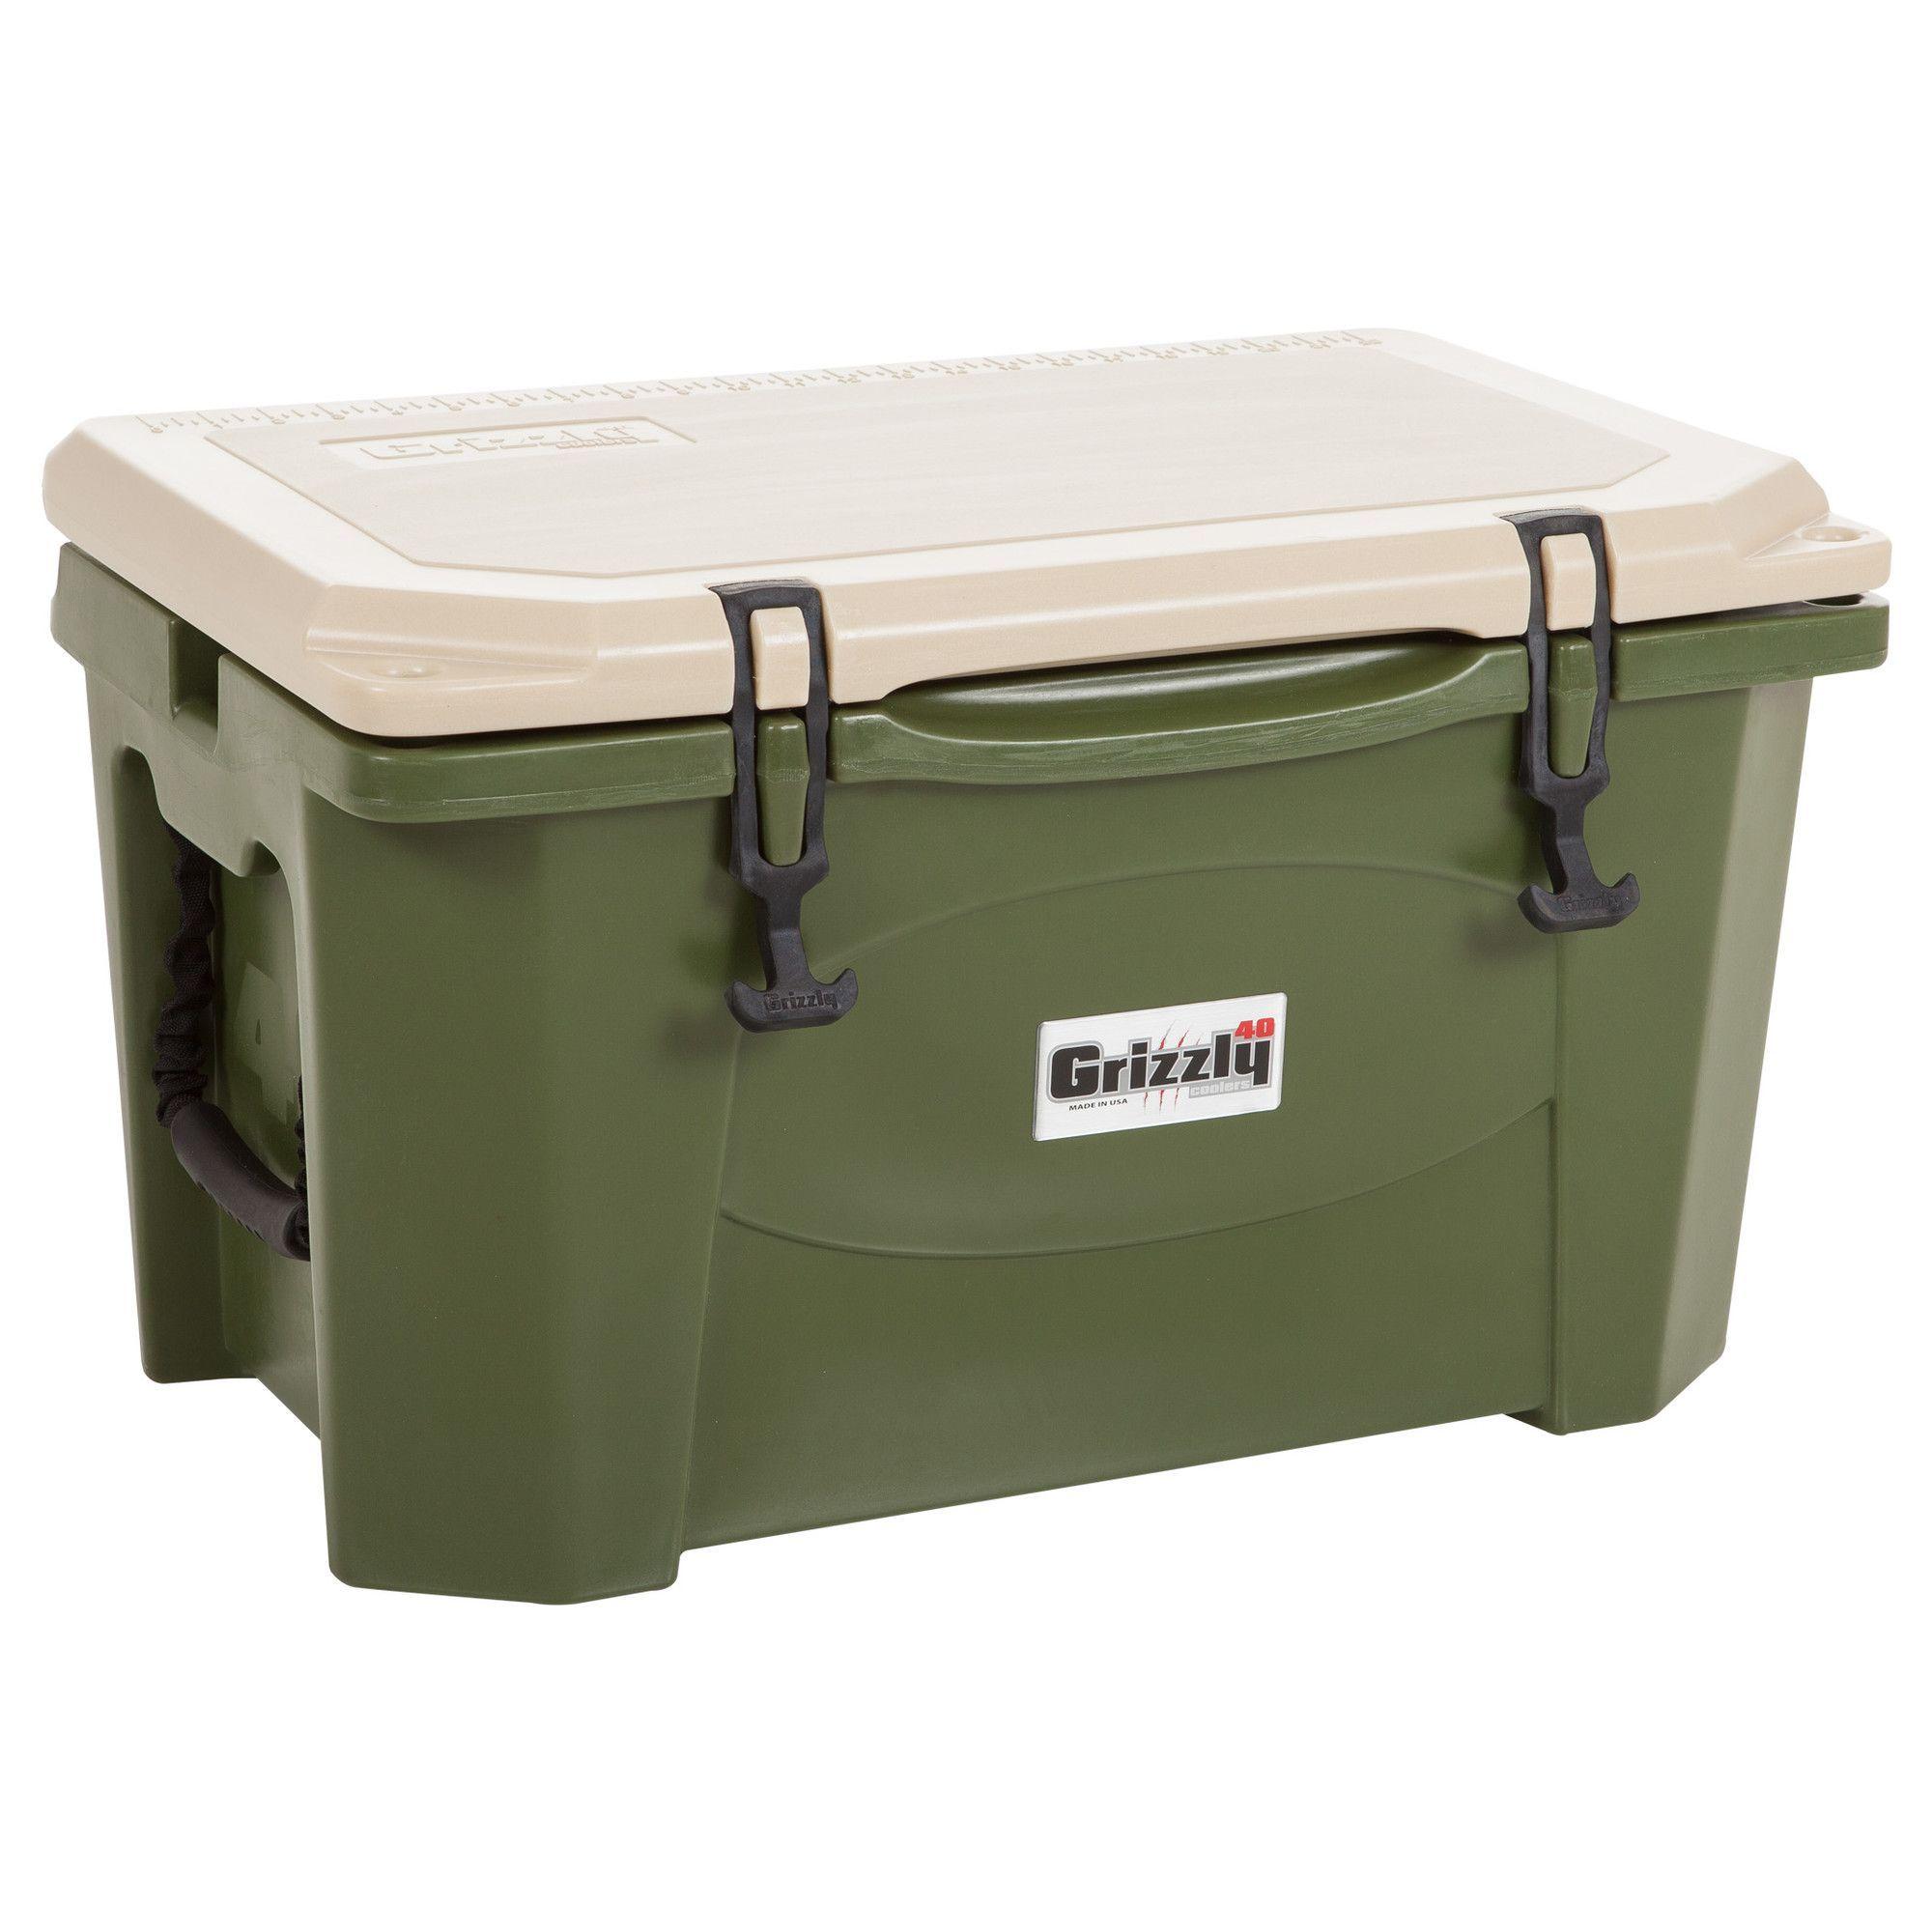 40 Qt Rotomolded Cooler Cooler Outdoor Cooler Yeti Cooler